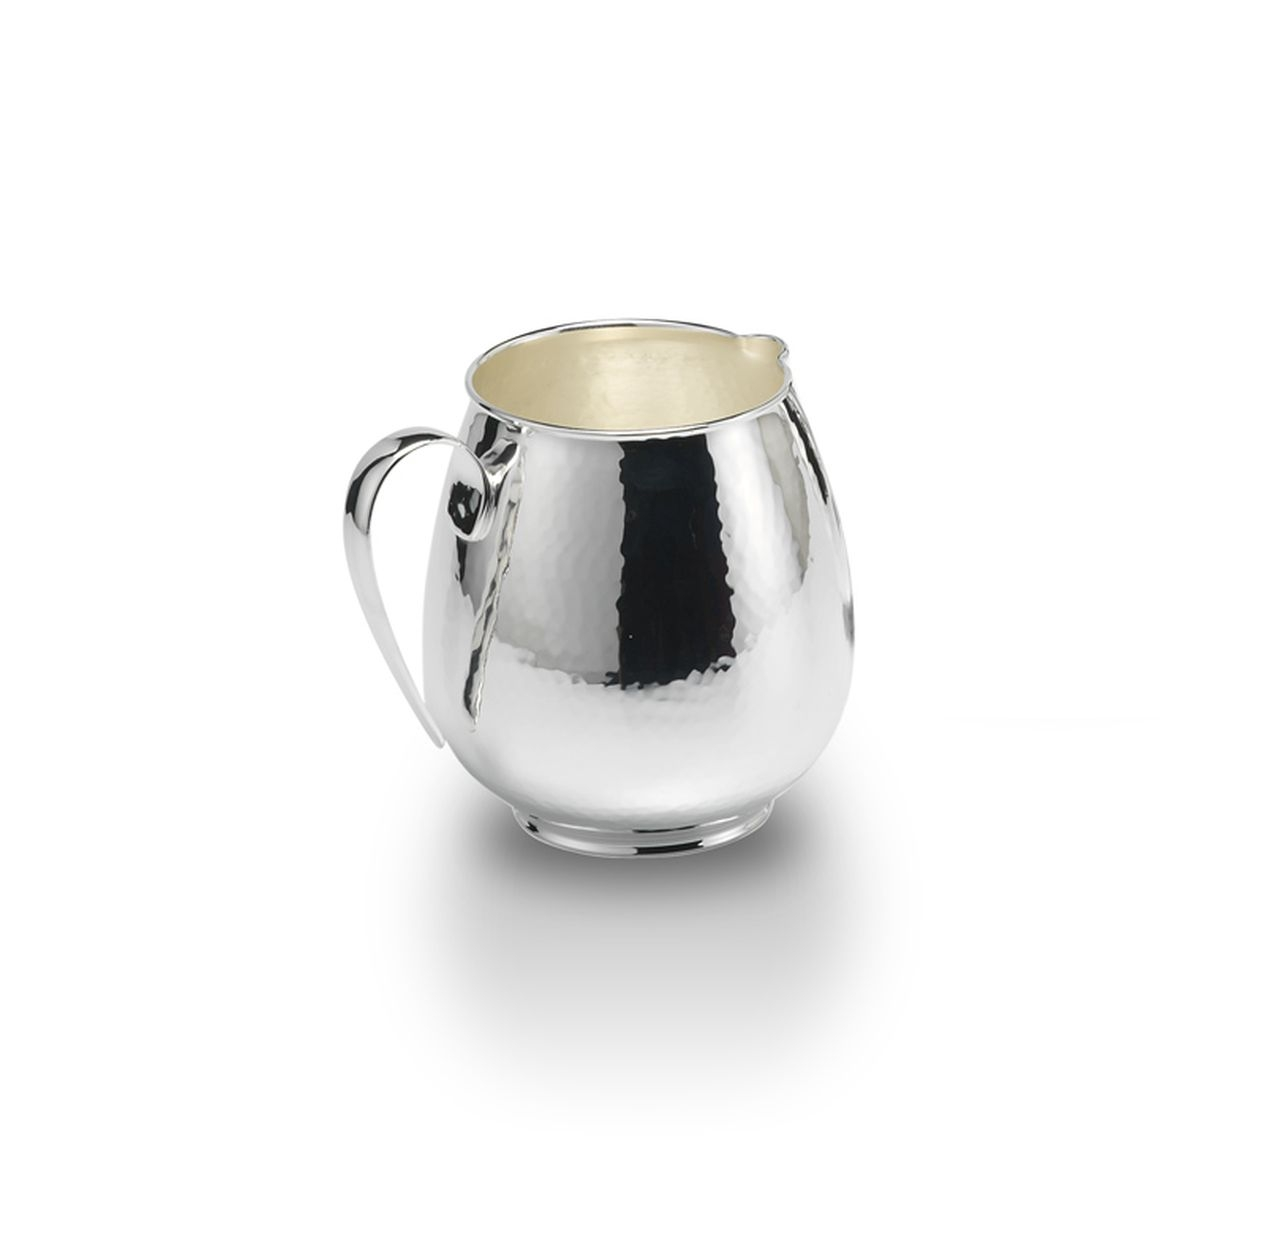 Brocca martellata stile Inglese argentata argento cm.13h diam.9,5